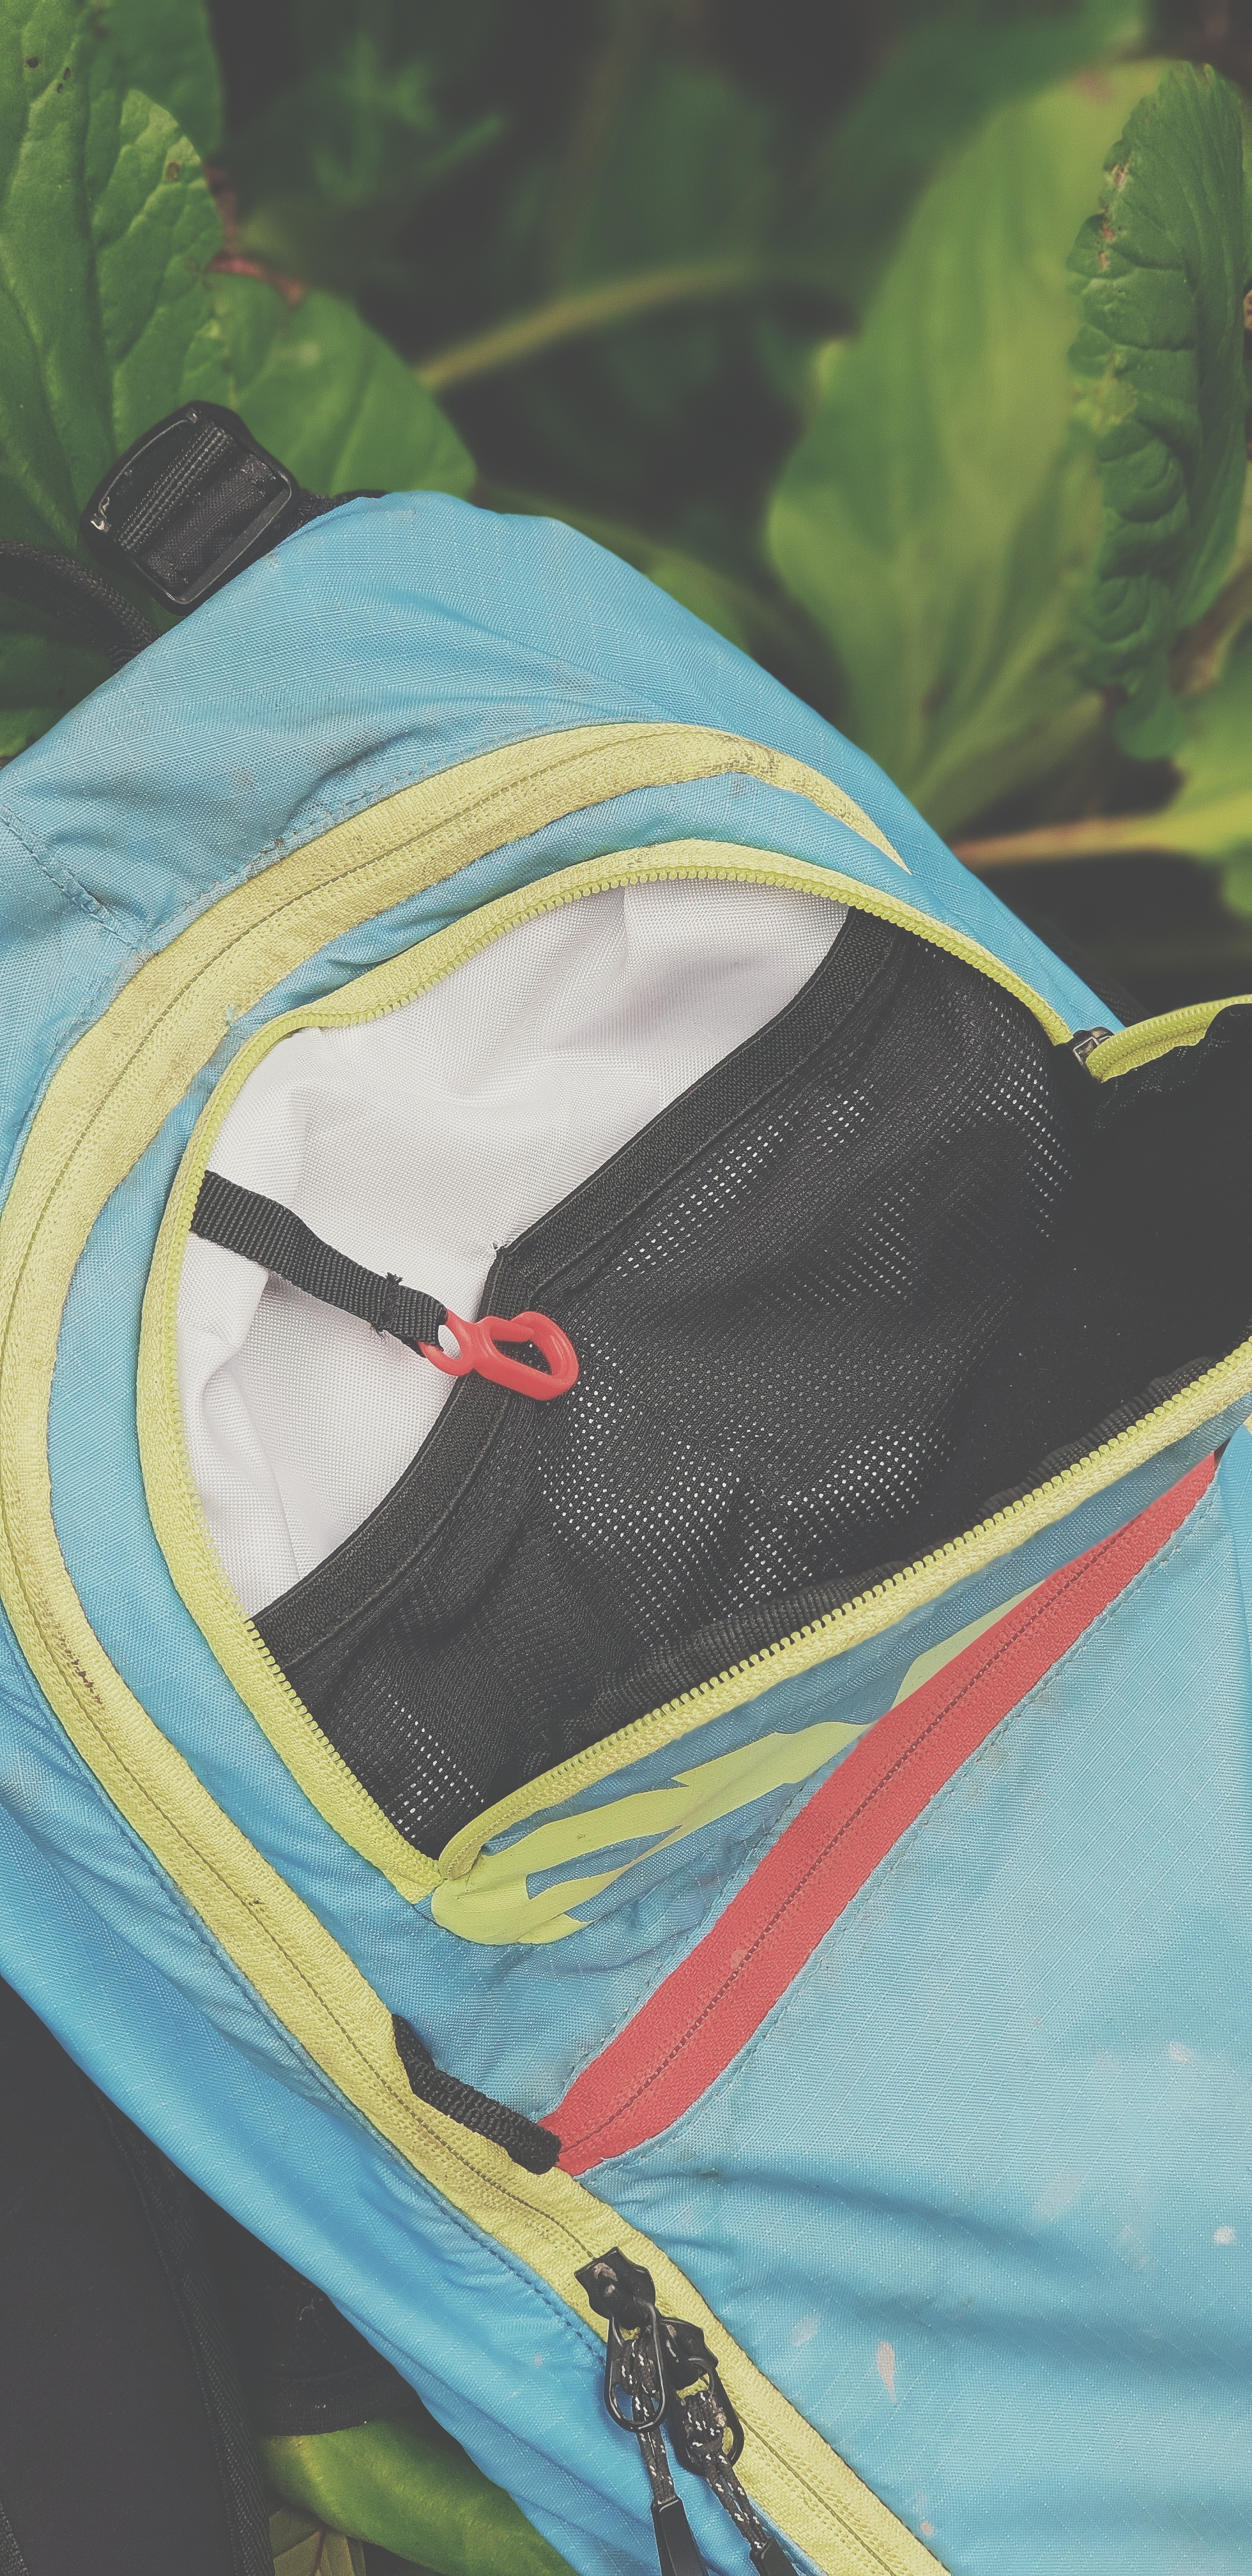 Evoc-FR-Team-Lite-backpack-long-term-review--3-